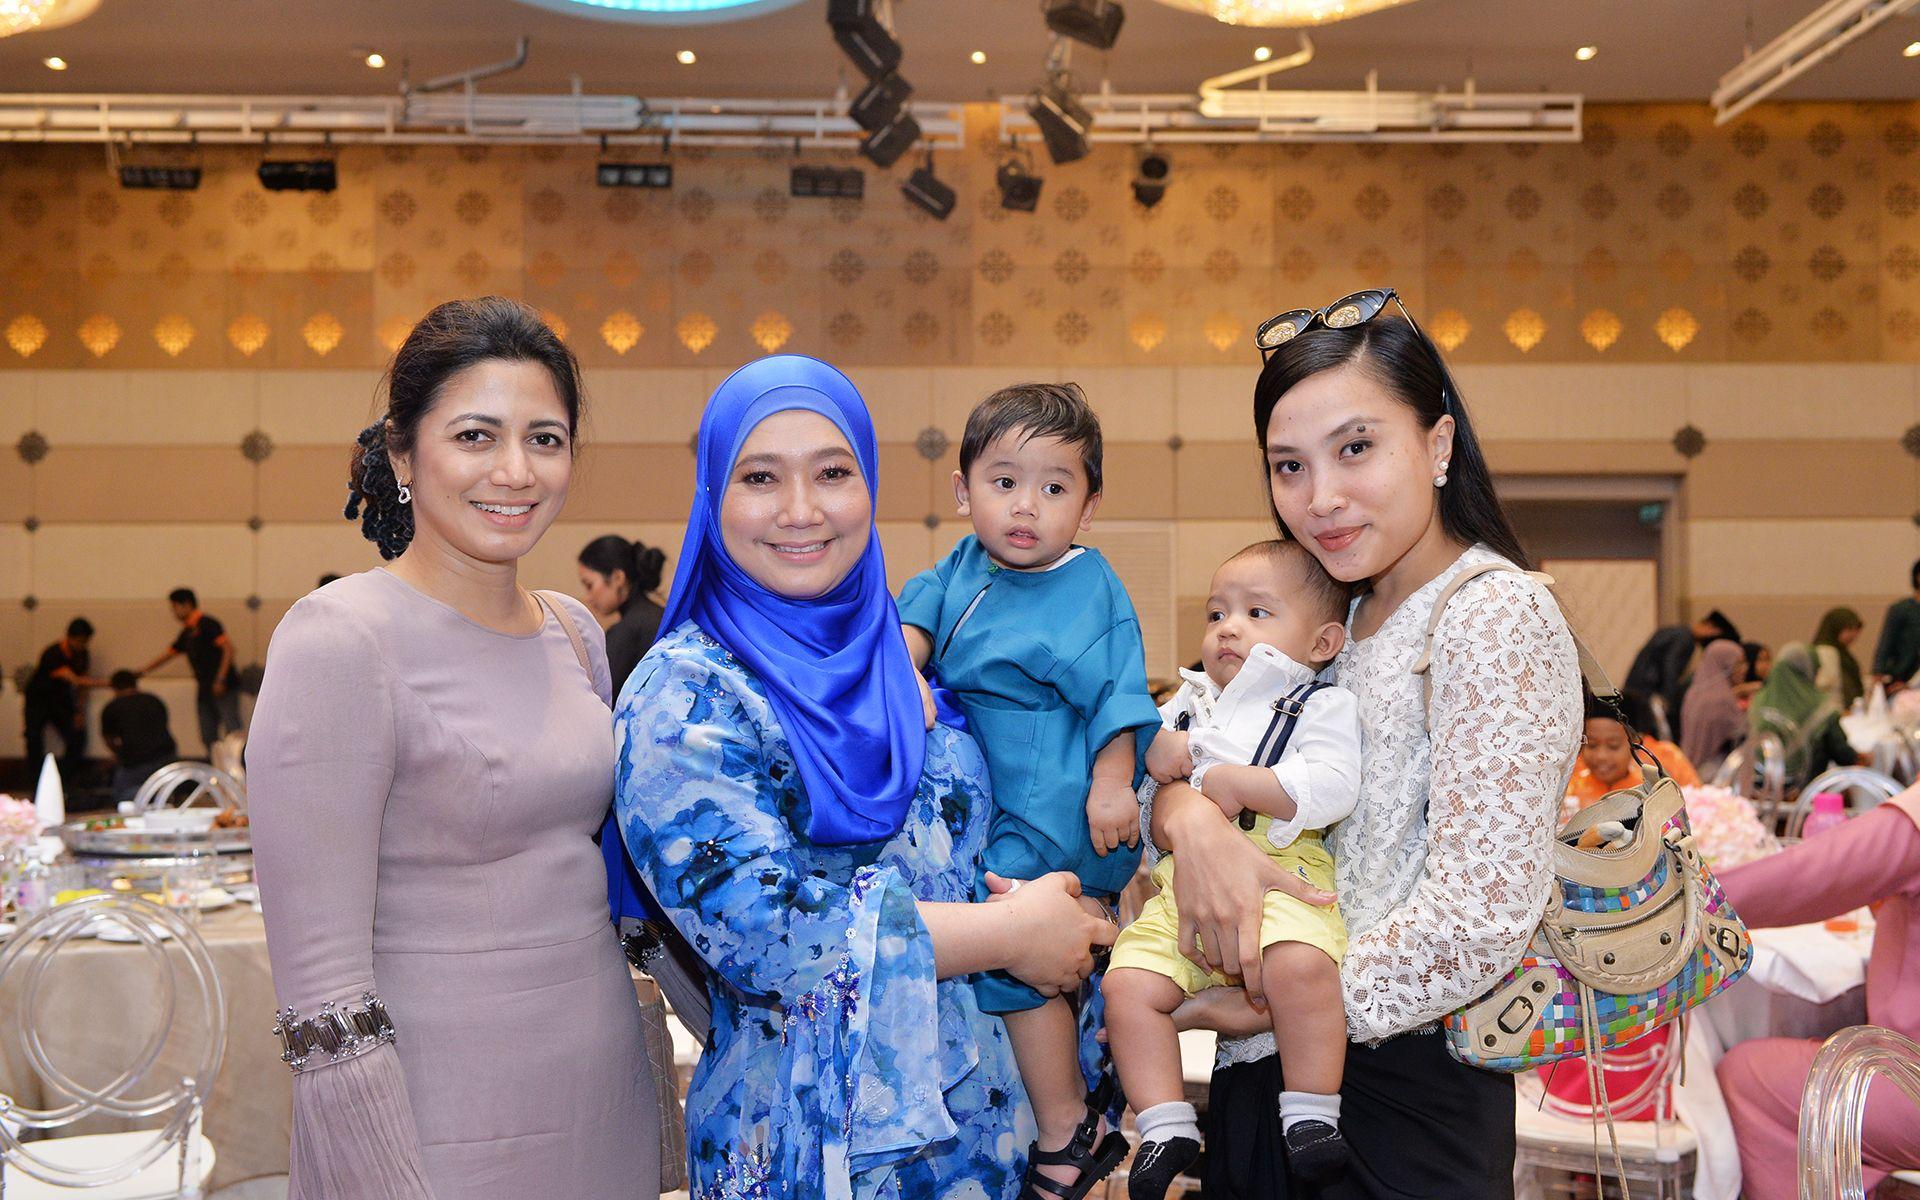 Zalifah Zakaria, Dato' Nazimah Hashim and Ais Rashid